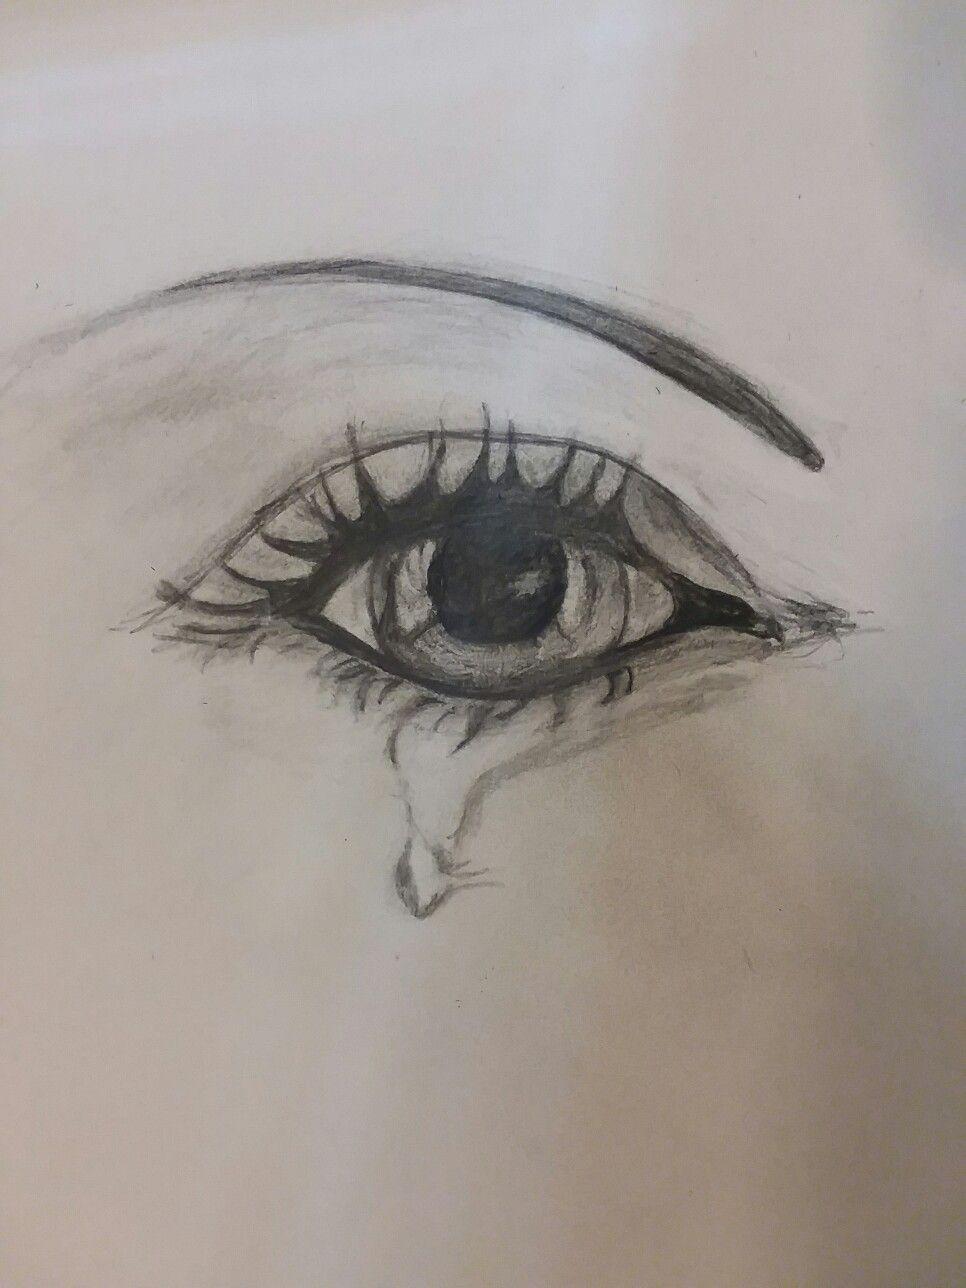 Pencil Drawing Eyes Charcoal Shading Eyelashes Tears By